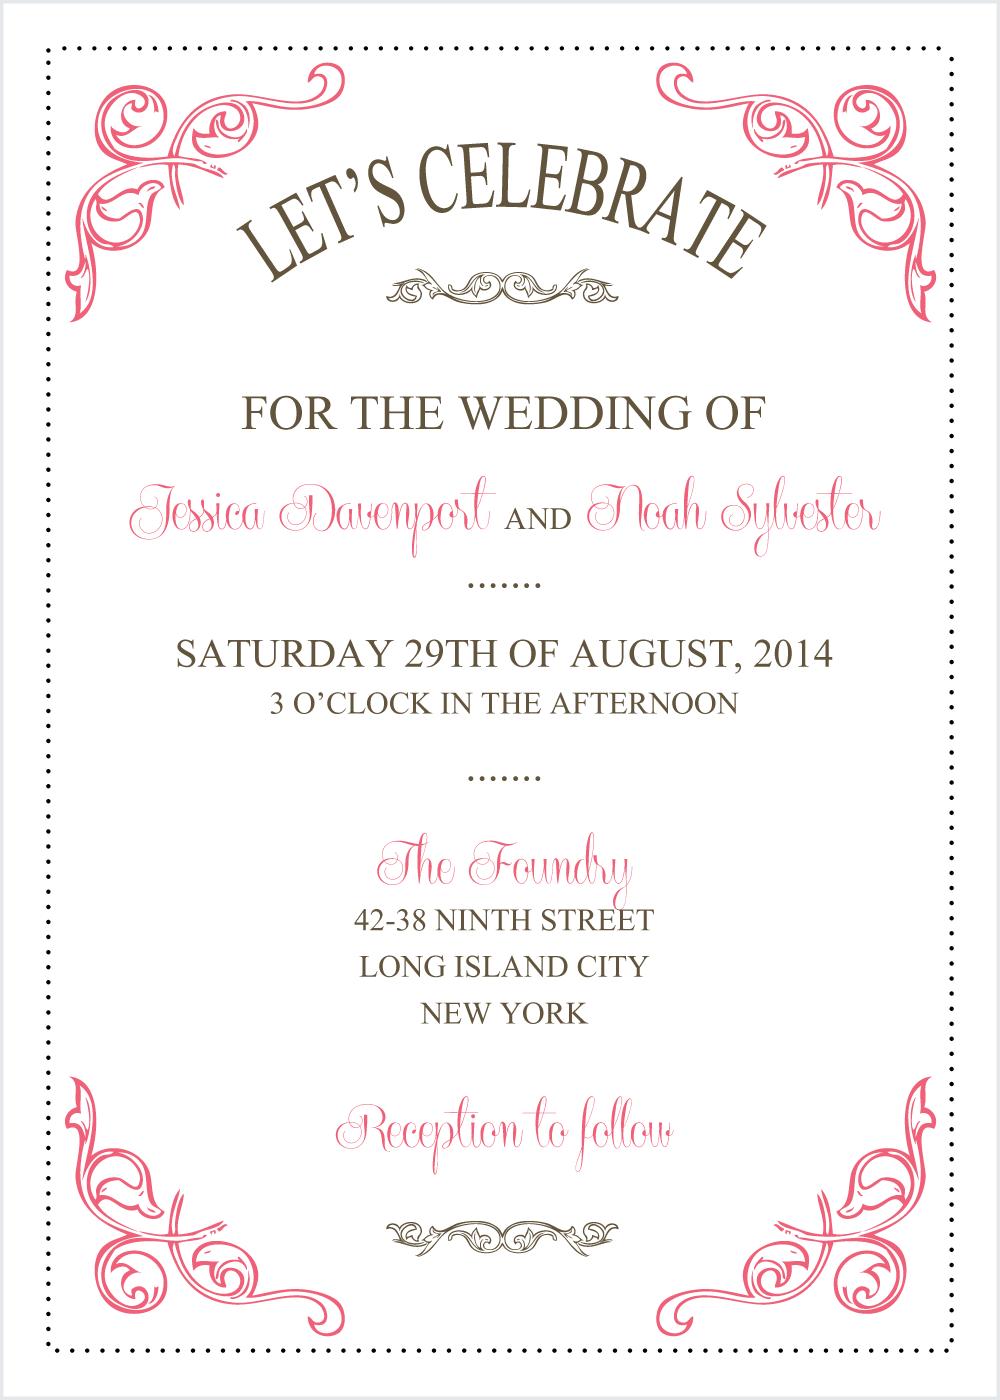 wedding invitation templates - Google Search  Wedding invitations printable templates, Free